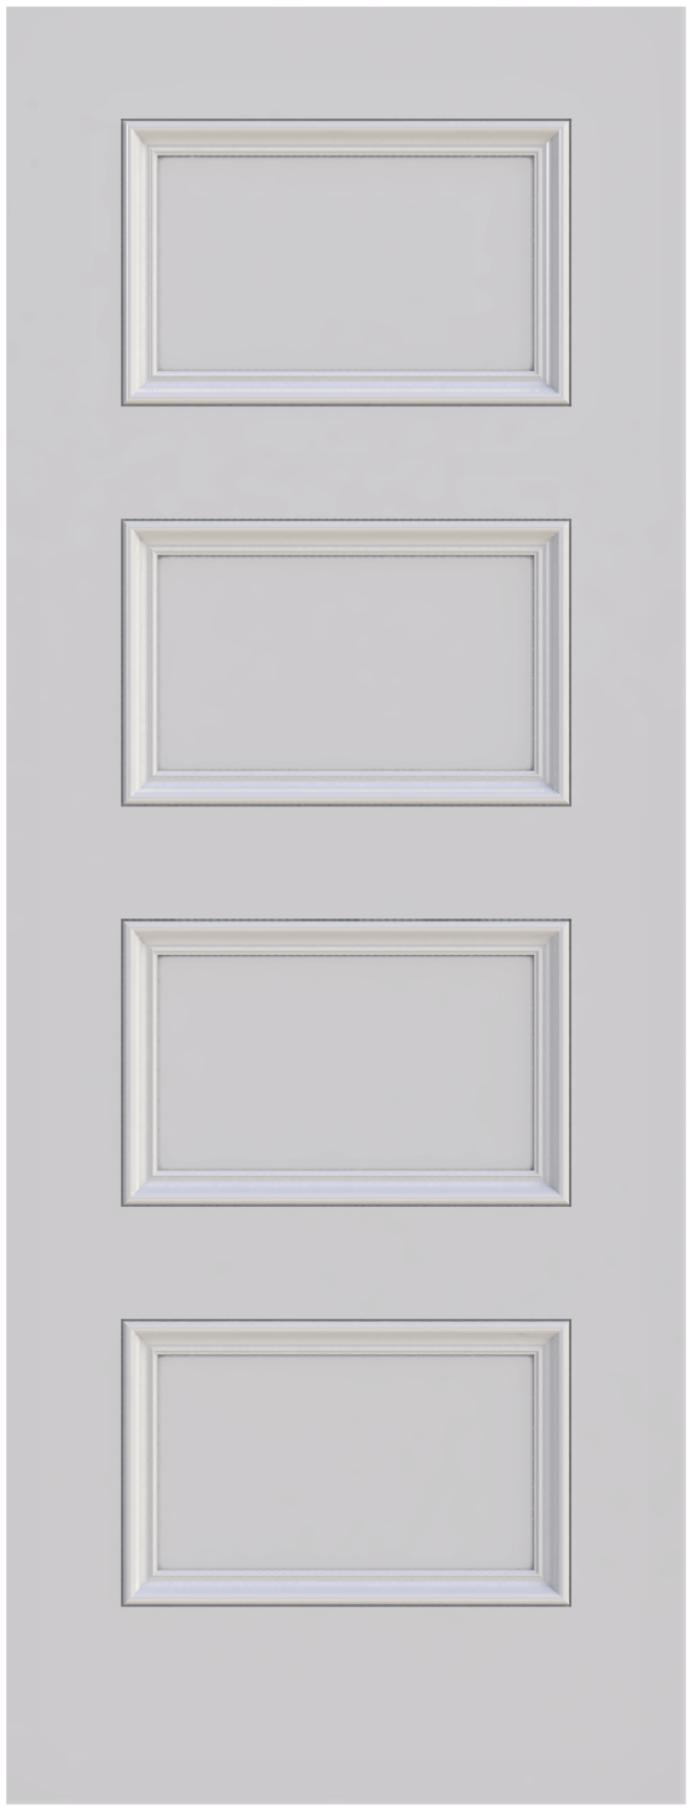 Quattro Knightsbridge 4 Panel Fire Door